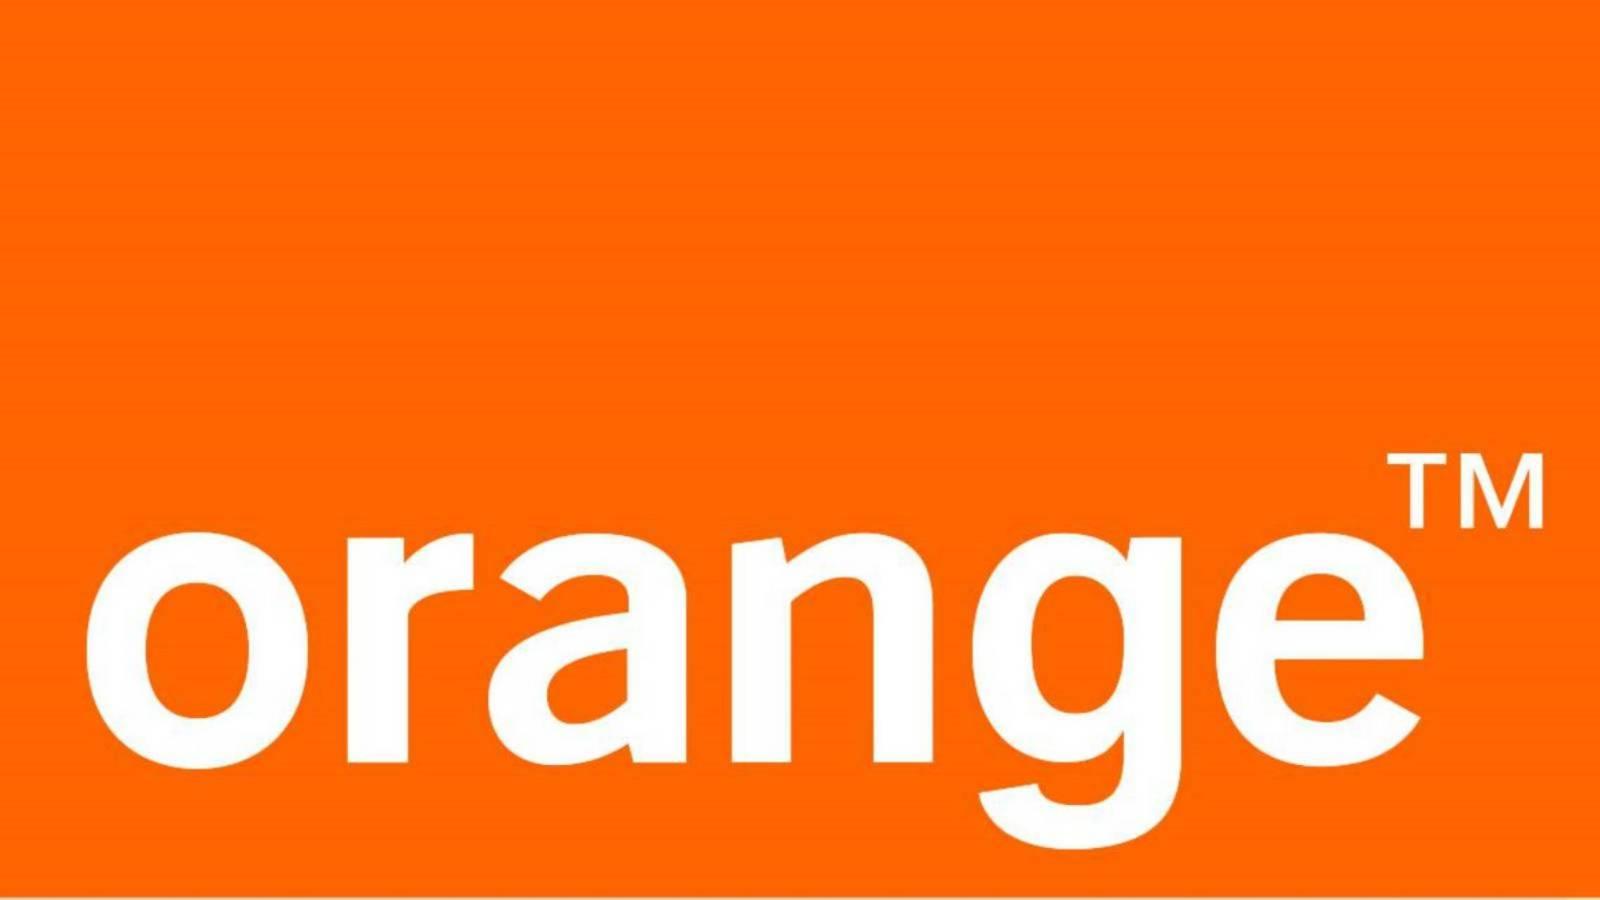 Orange celebrare